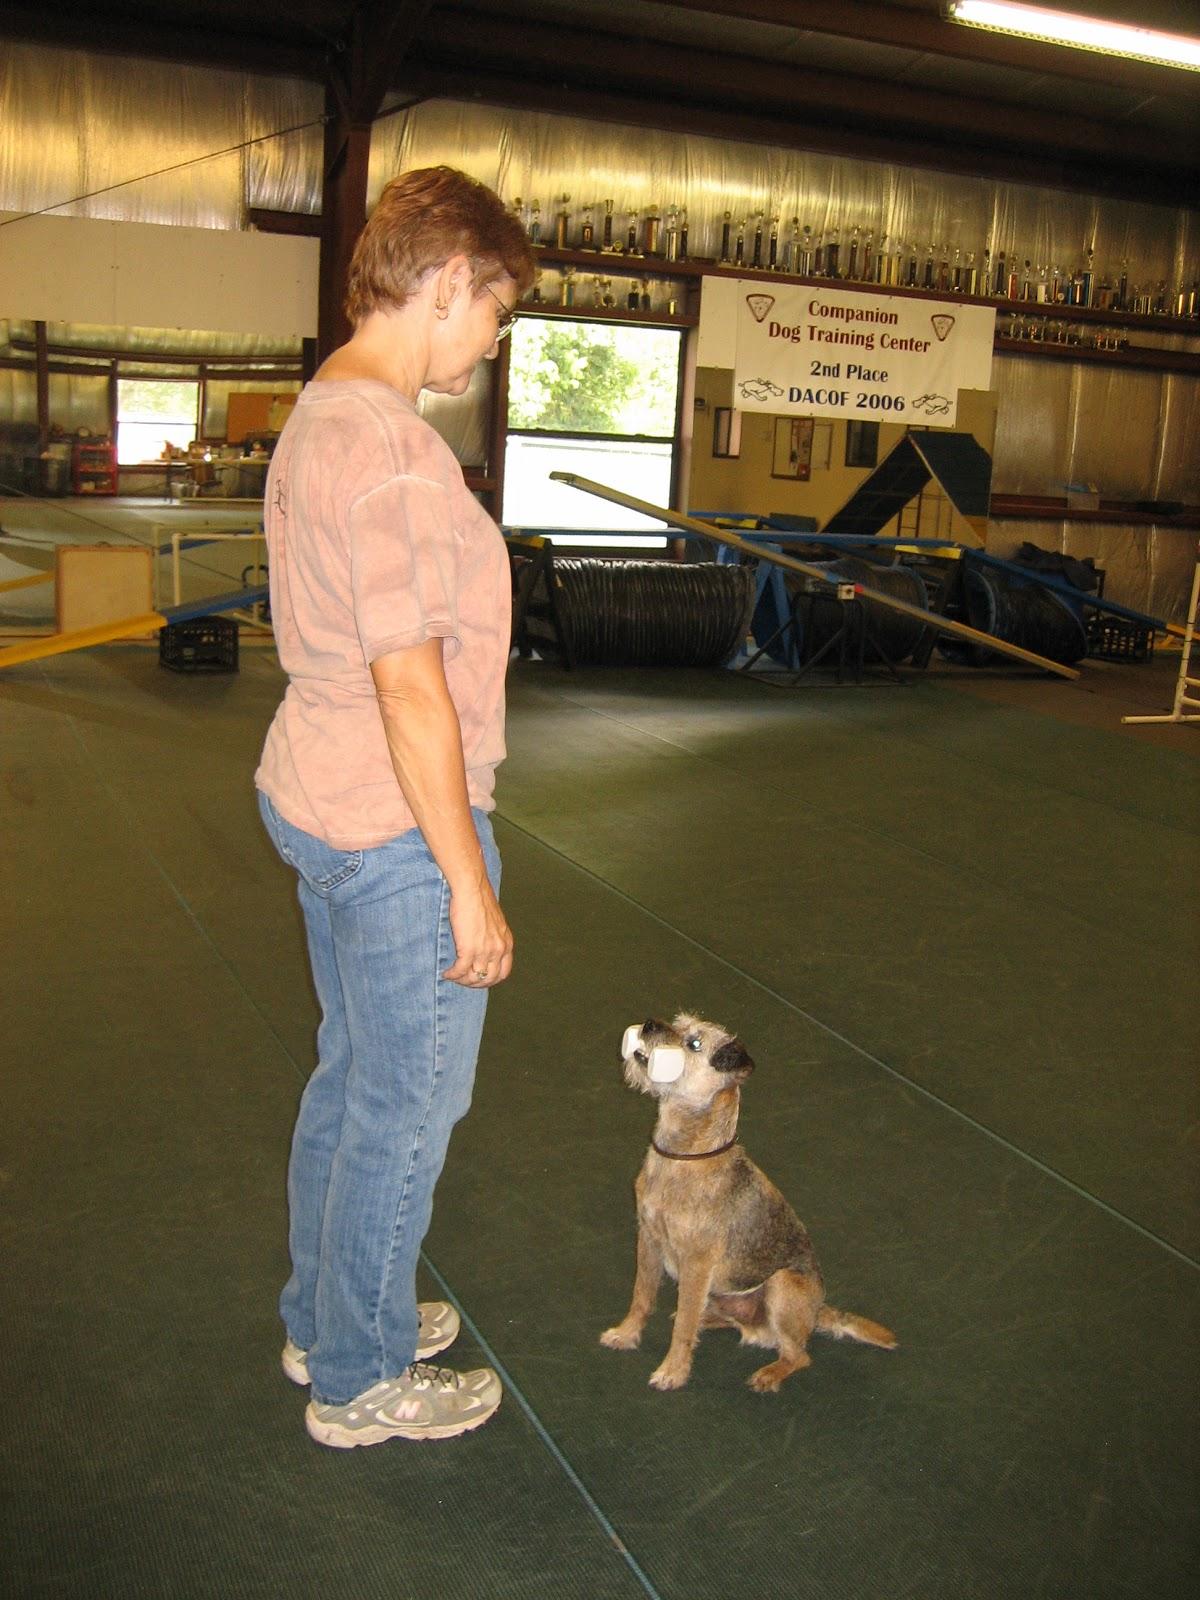 companion-dog-training